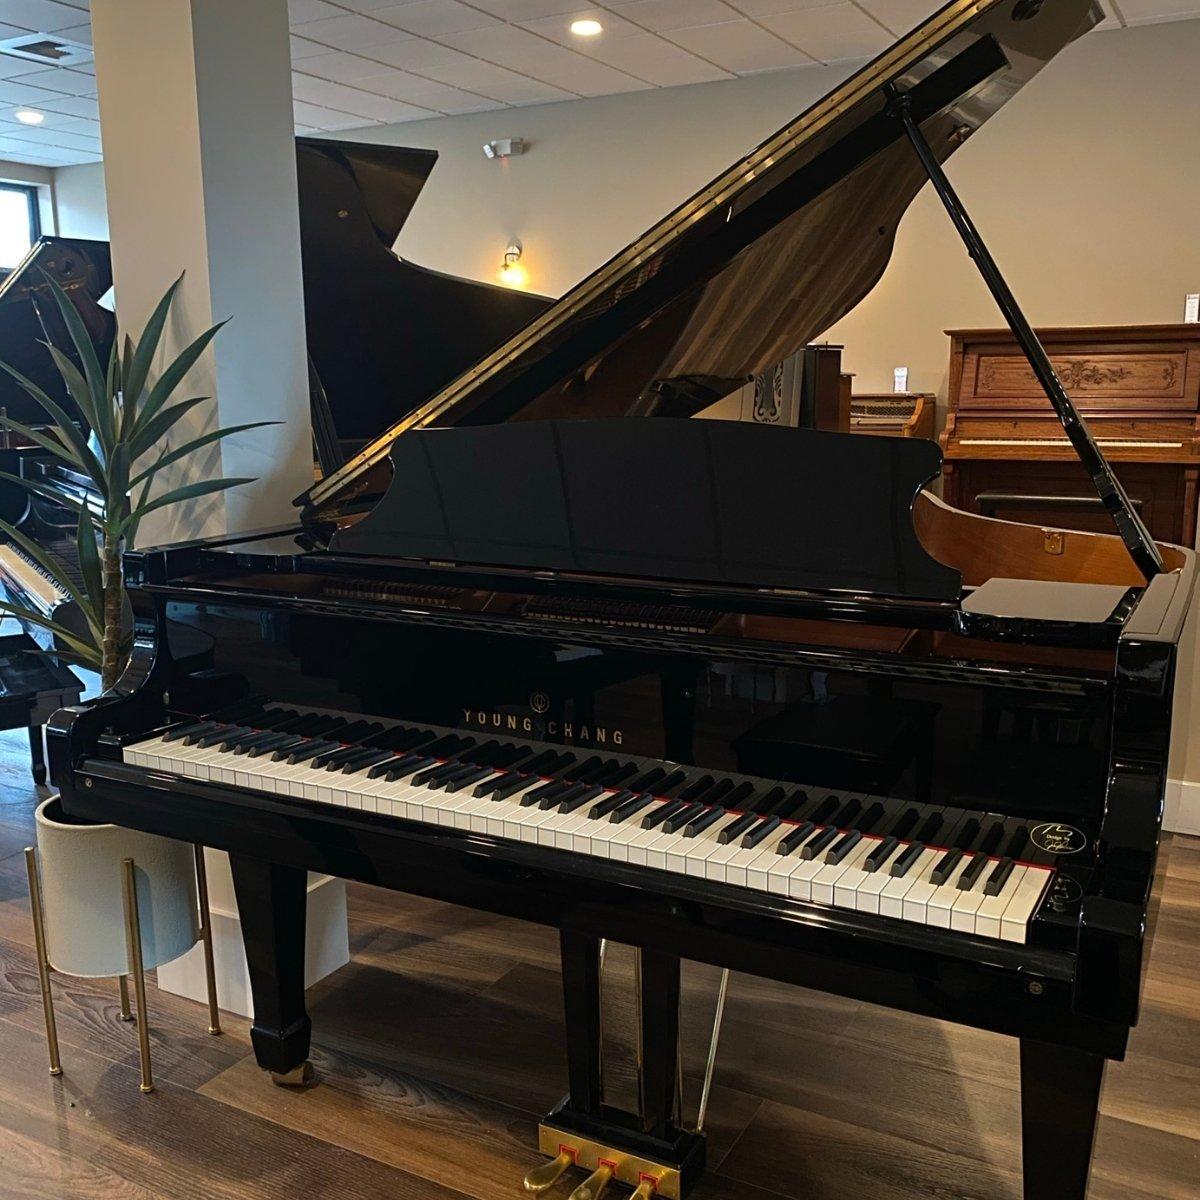 Young Chang 5'11 Model G-185 Grand Piano